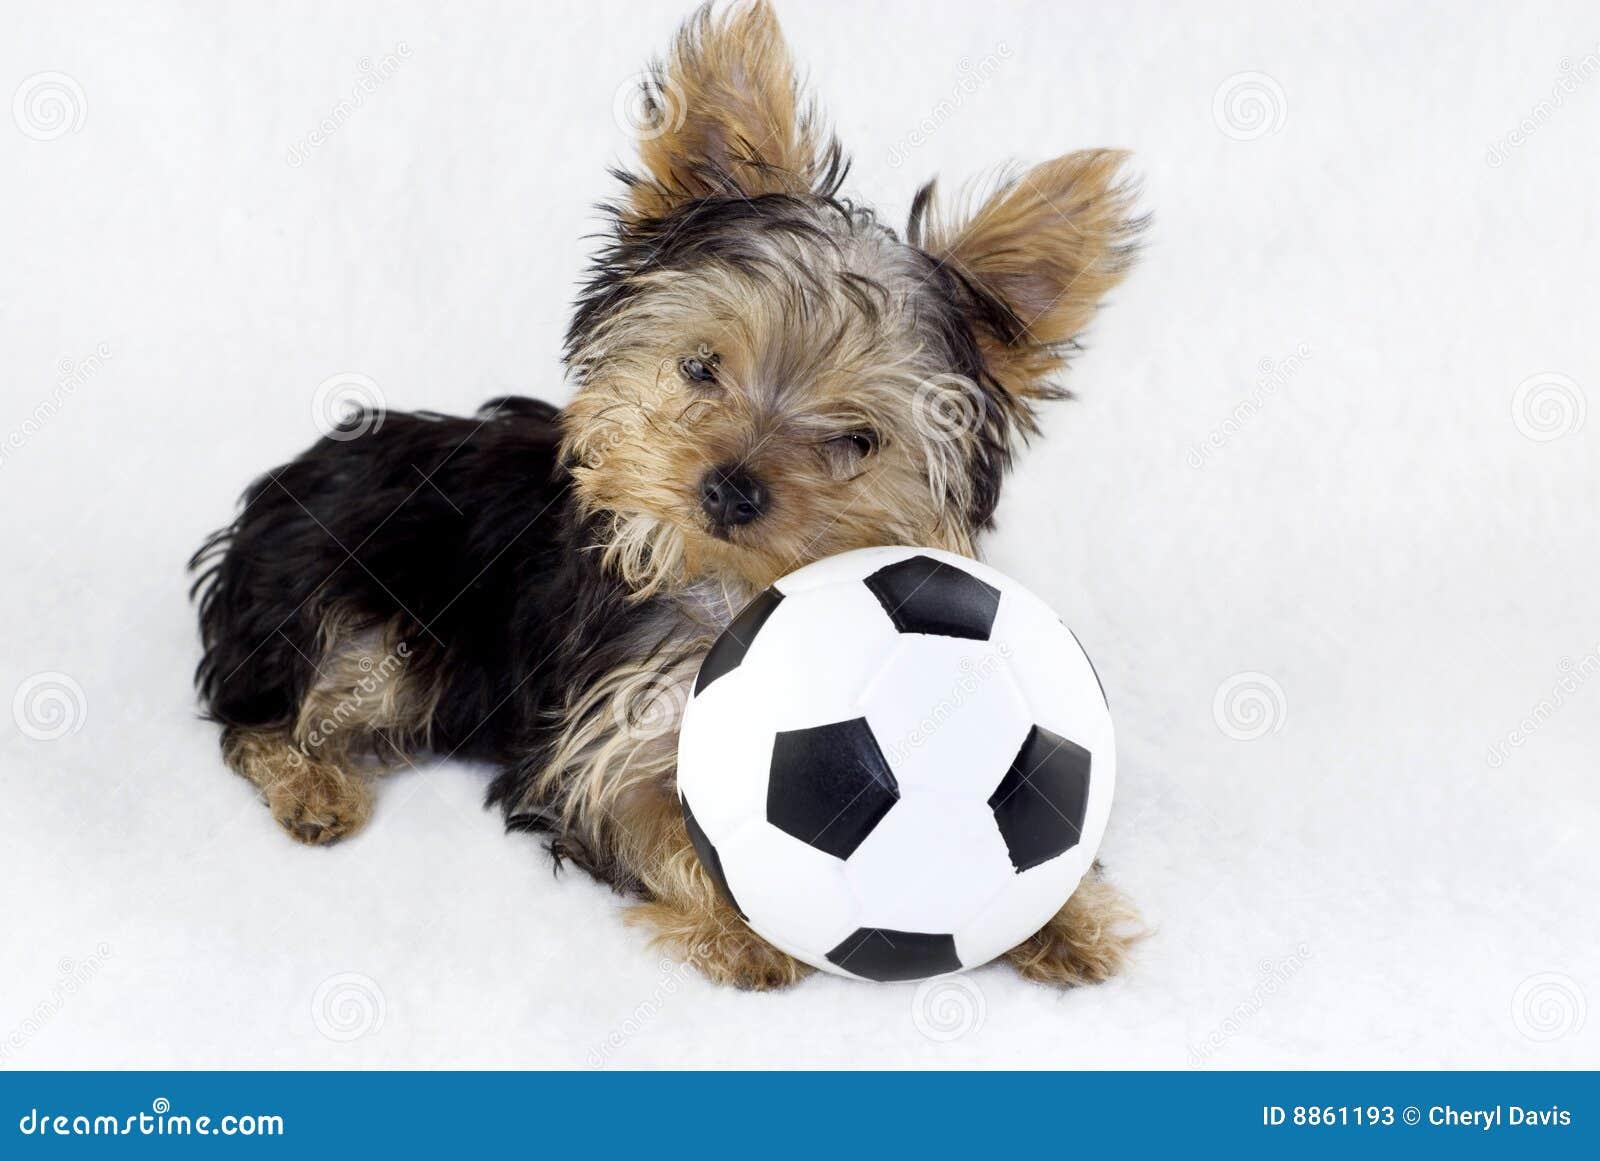 Dog Minion Toy